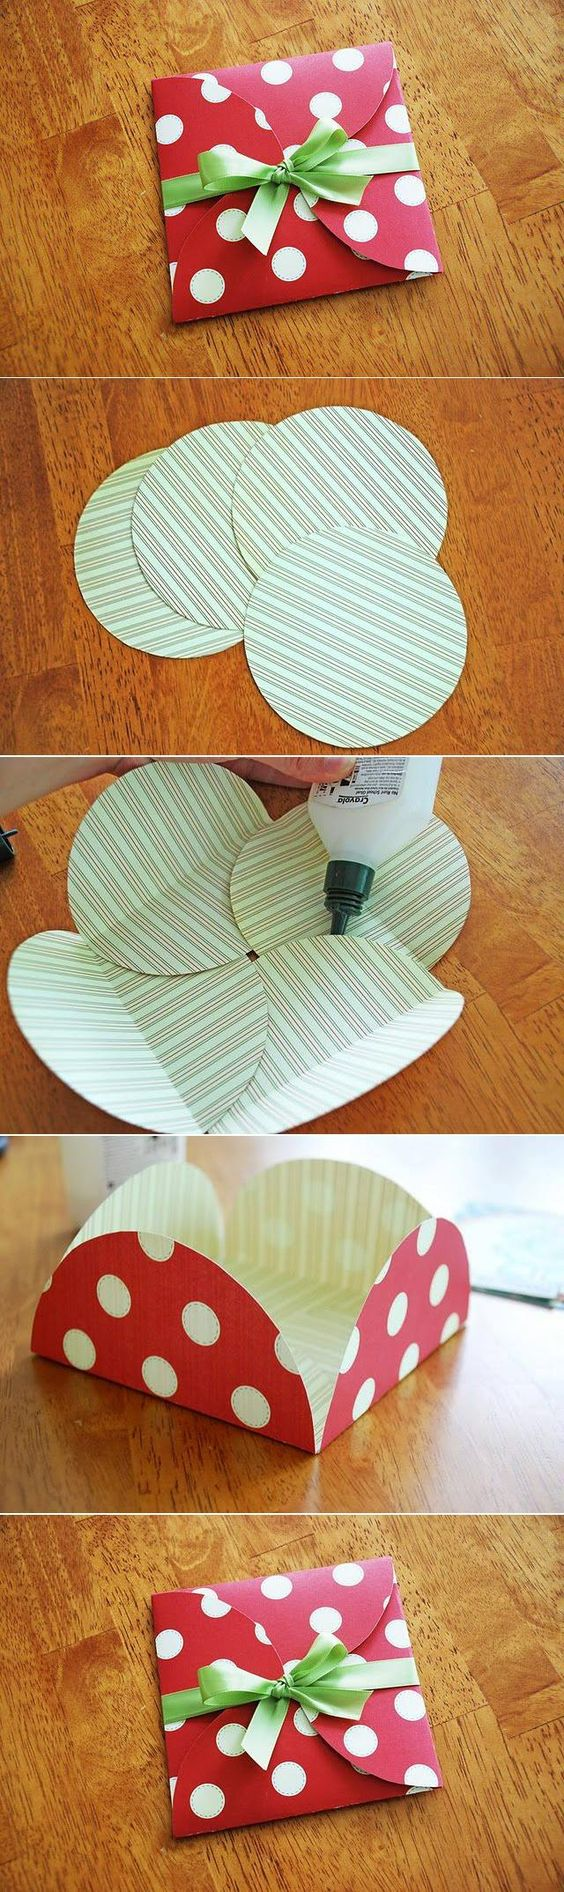 DIY Simple Beautiful Envelope Envelopes, Simple and DIY and crafts